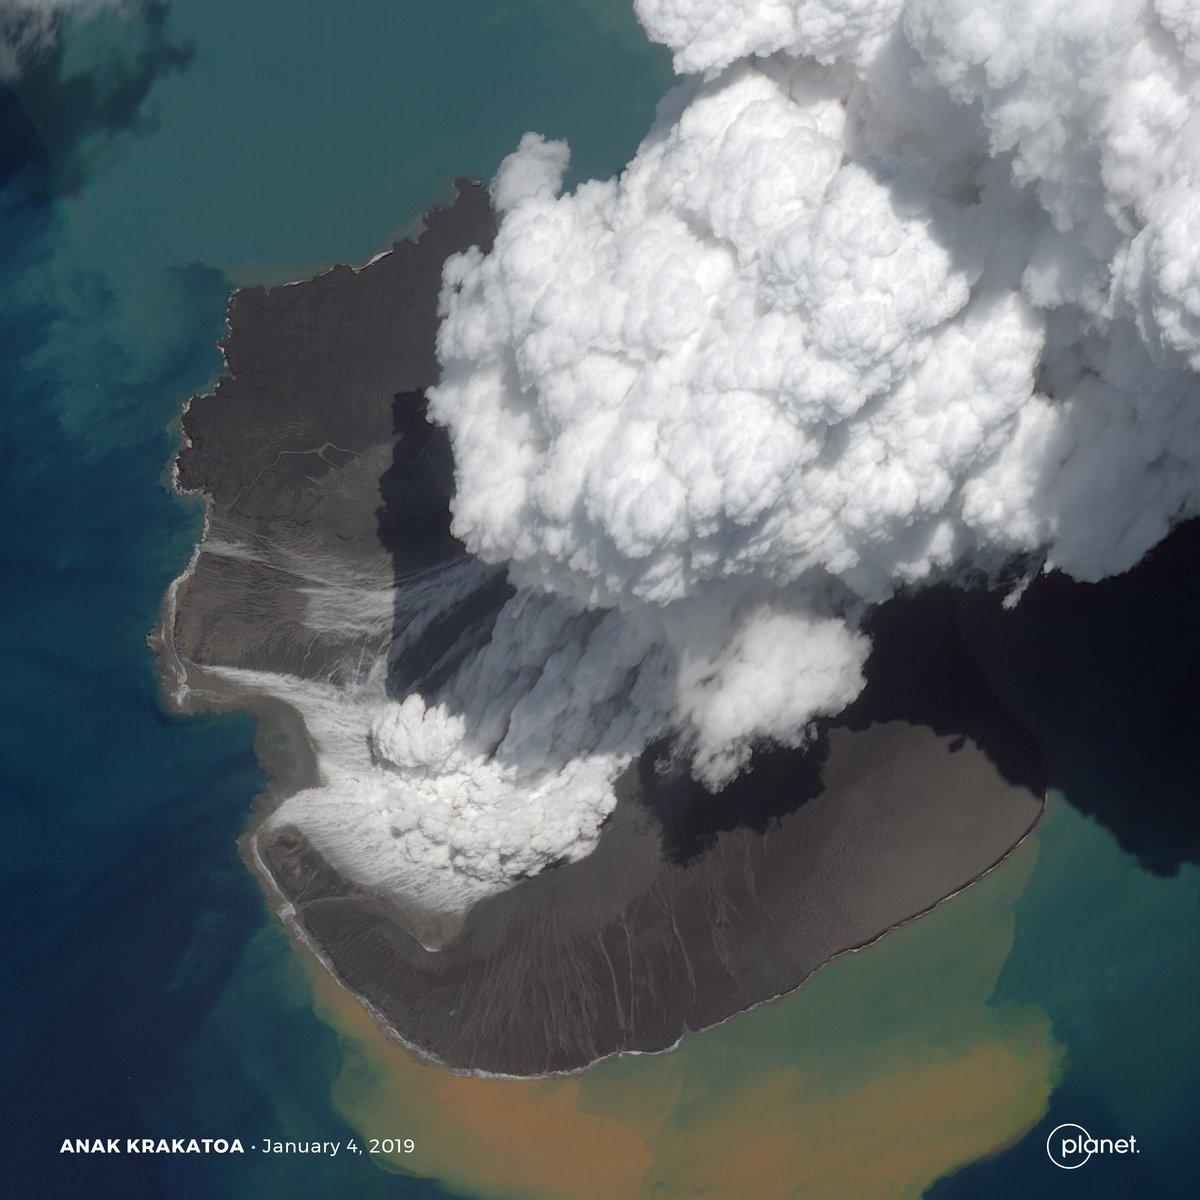 krakatoa Planet